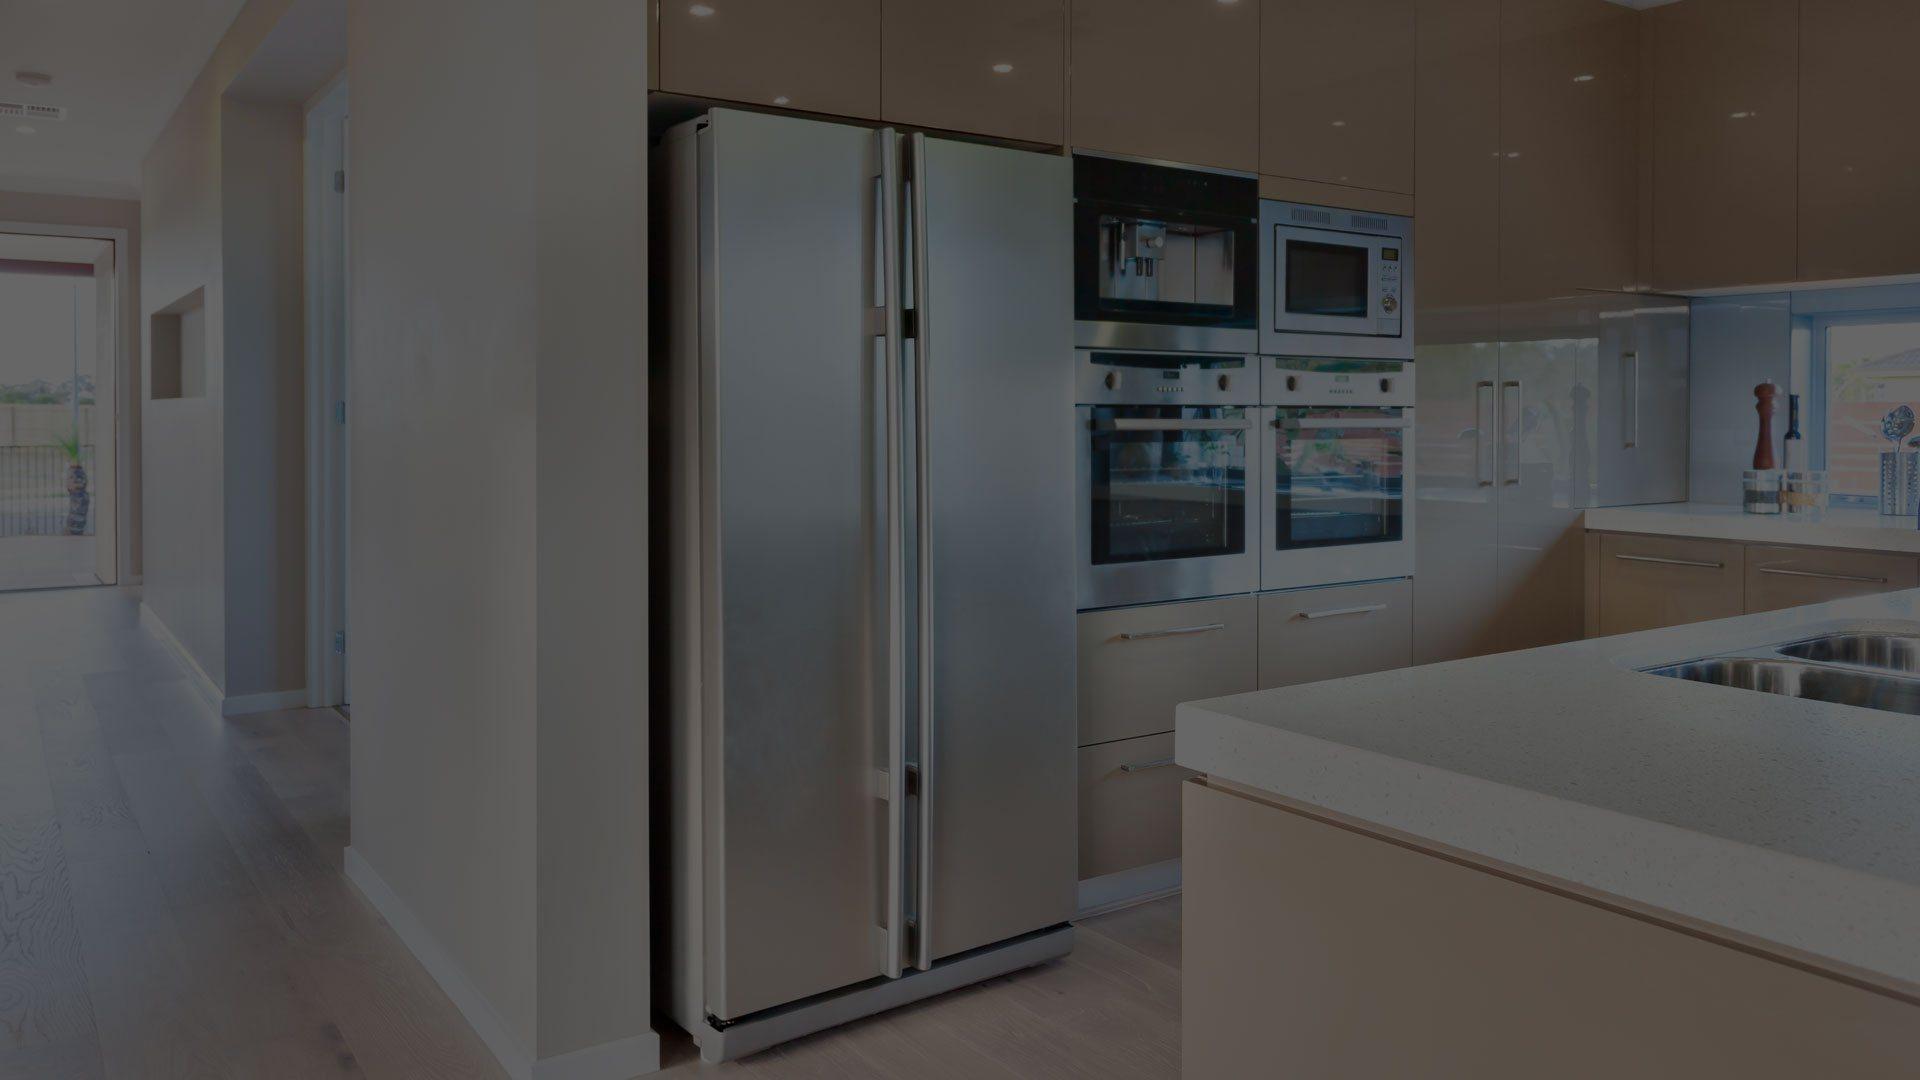 Preferred Comfort HVAC Services